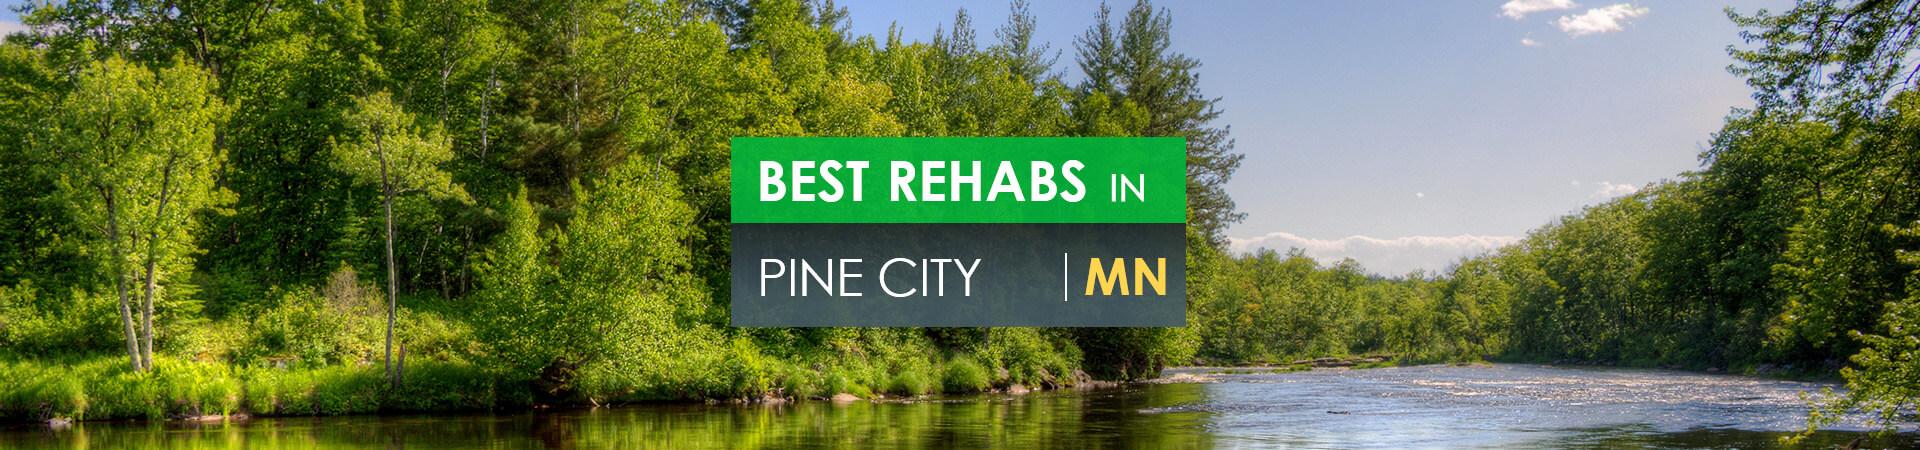 Best rehabs in Pine City, MN